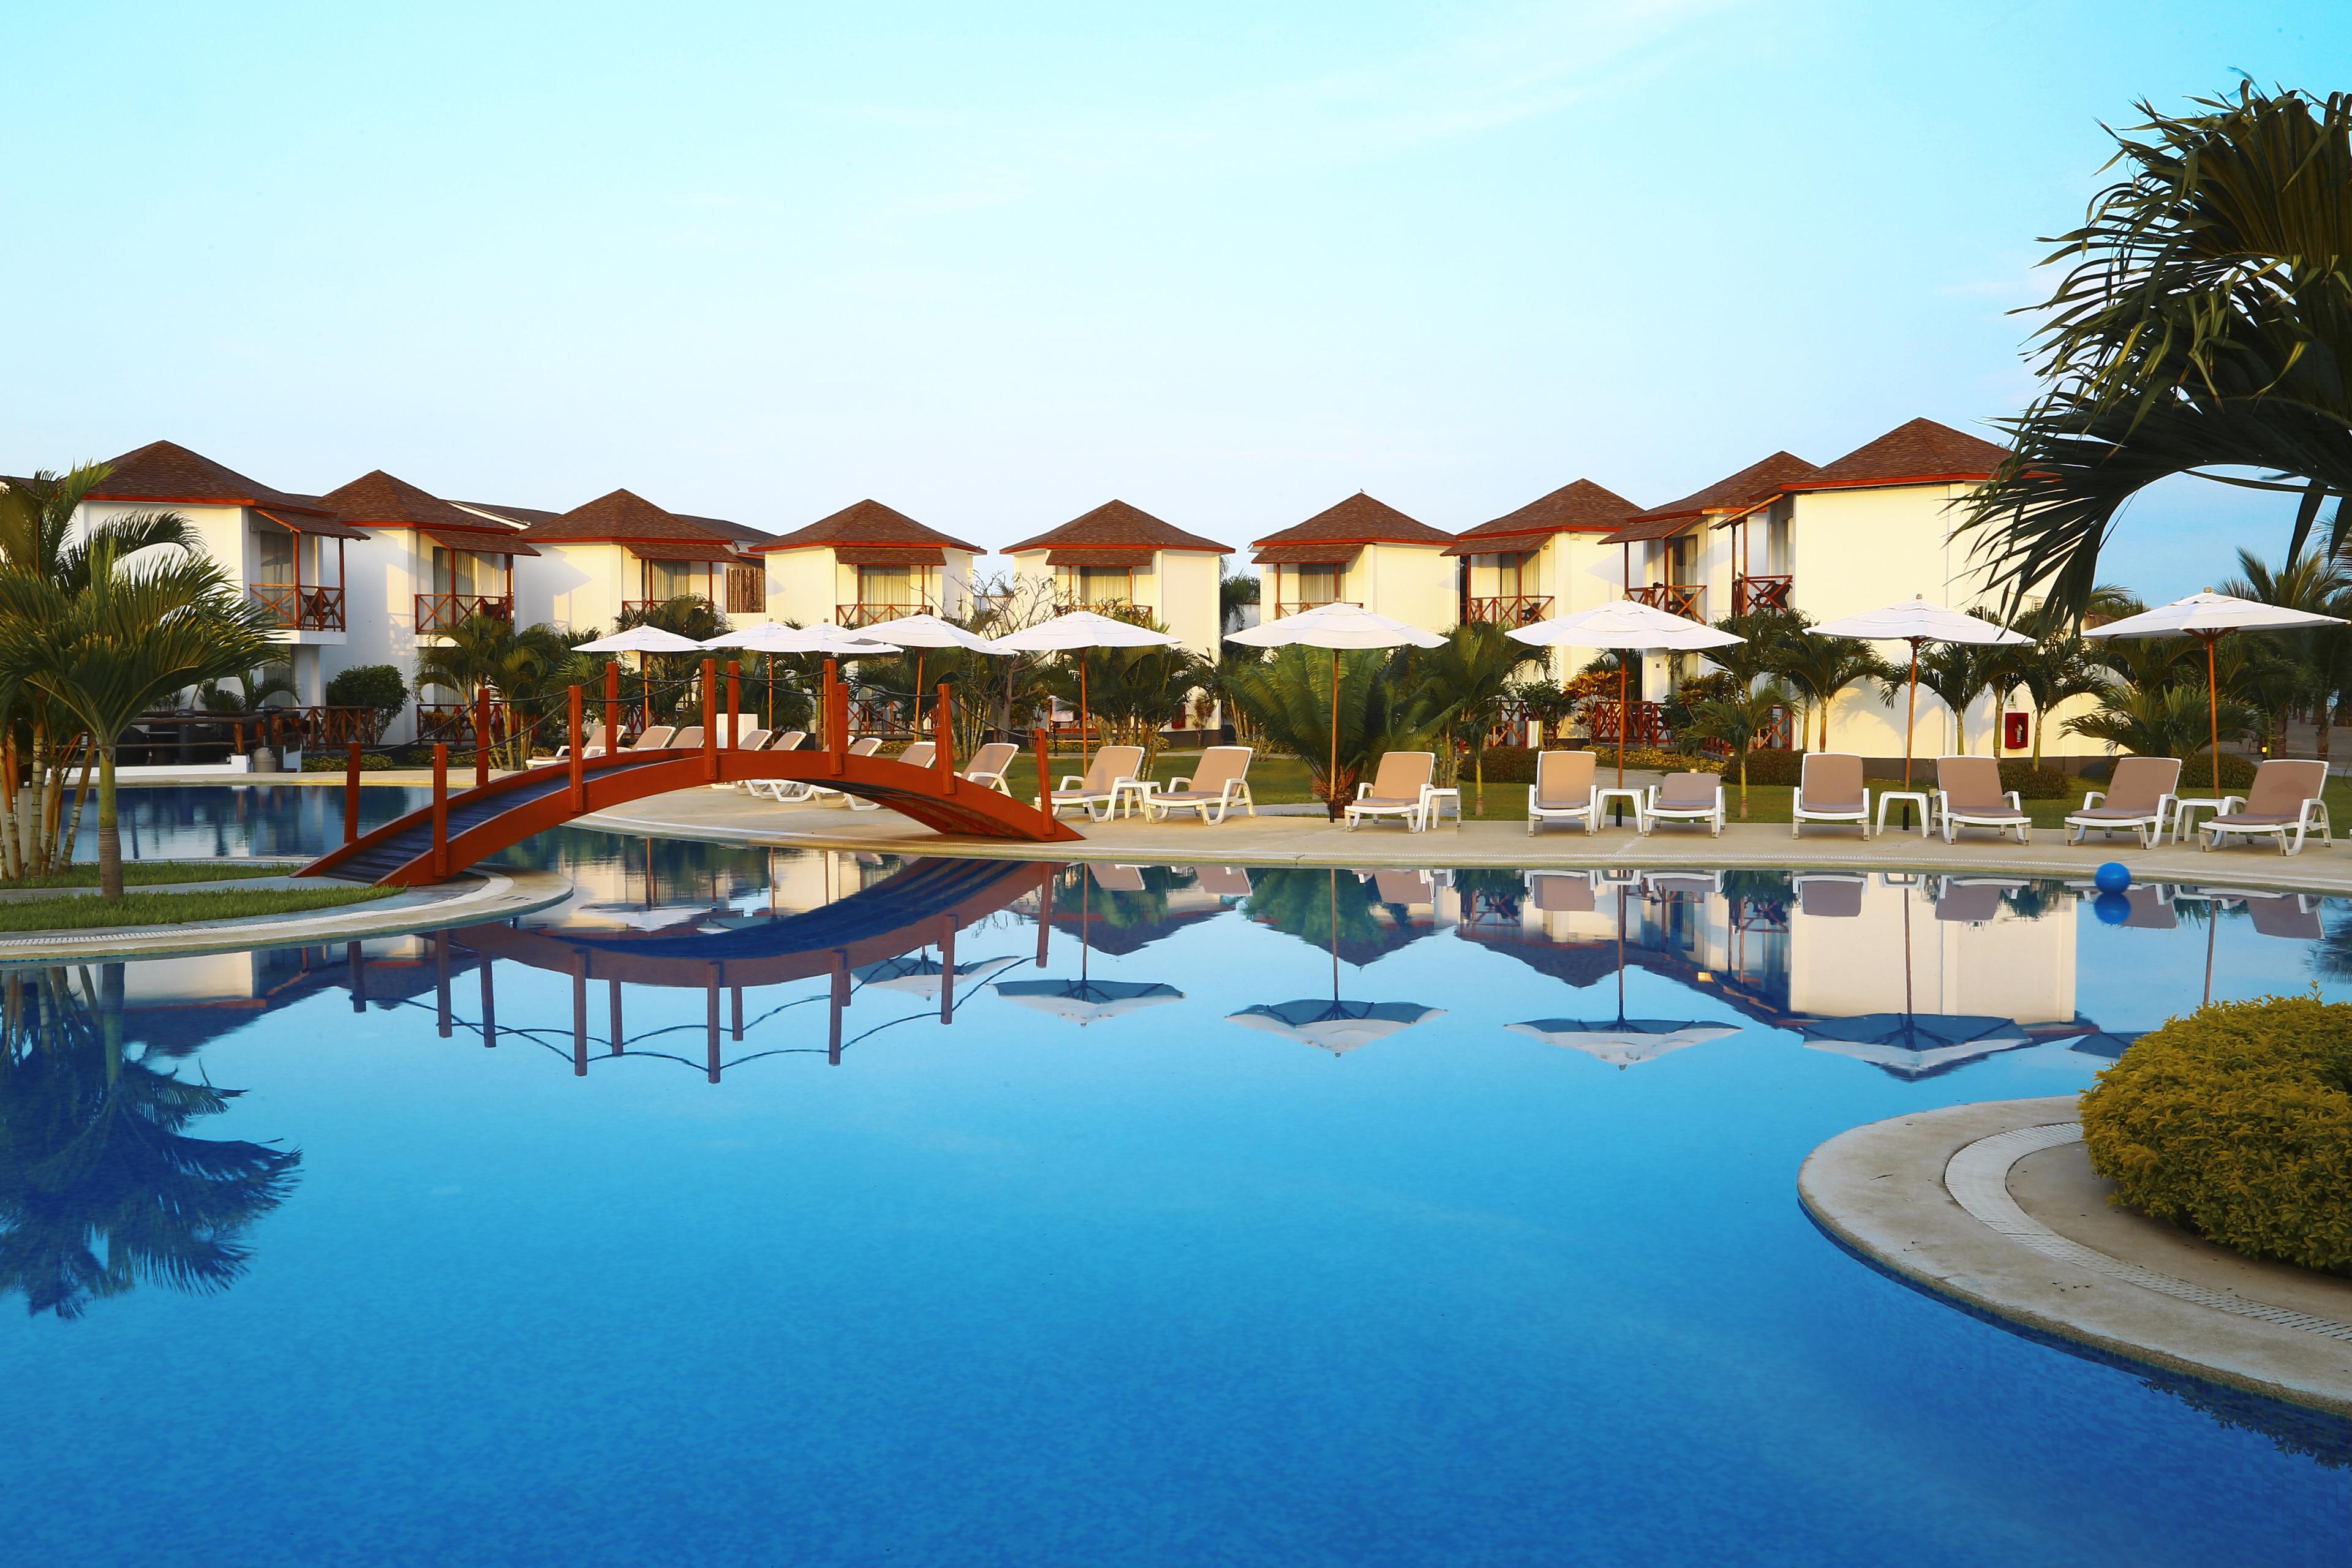 casa_andina_hotel_peru_select_zorritos_tumbes_jardines_piscina